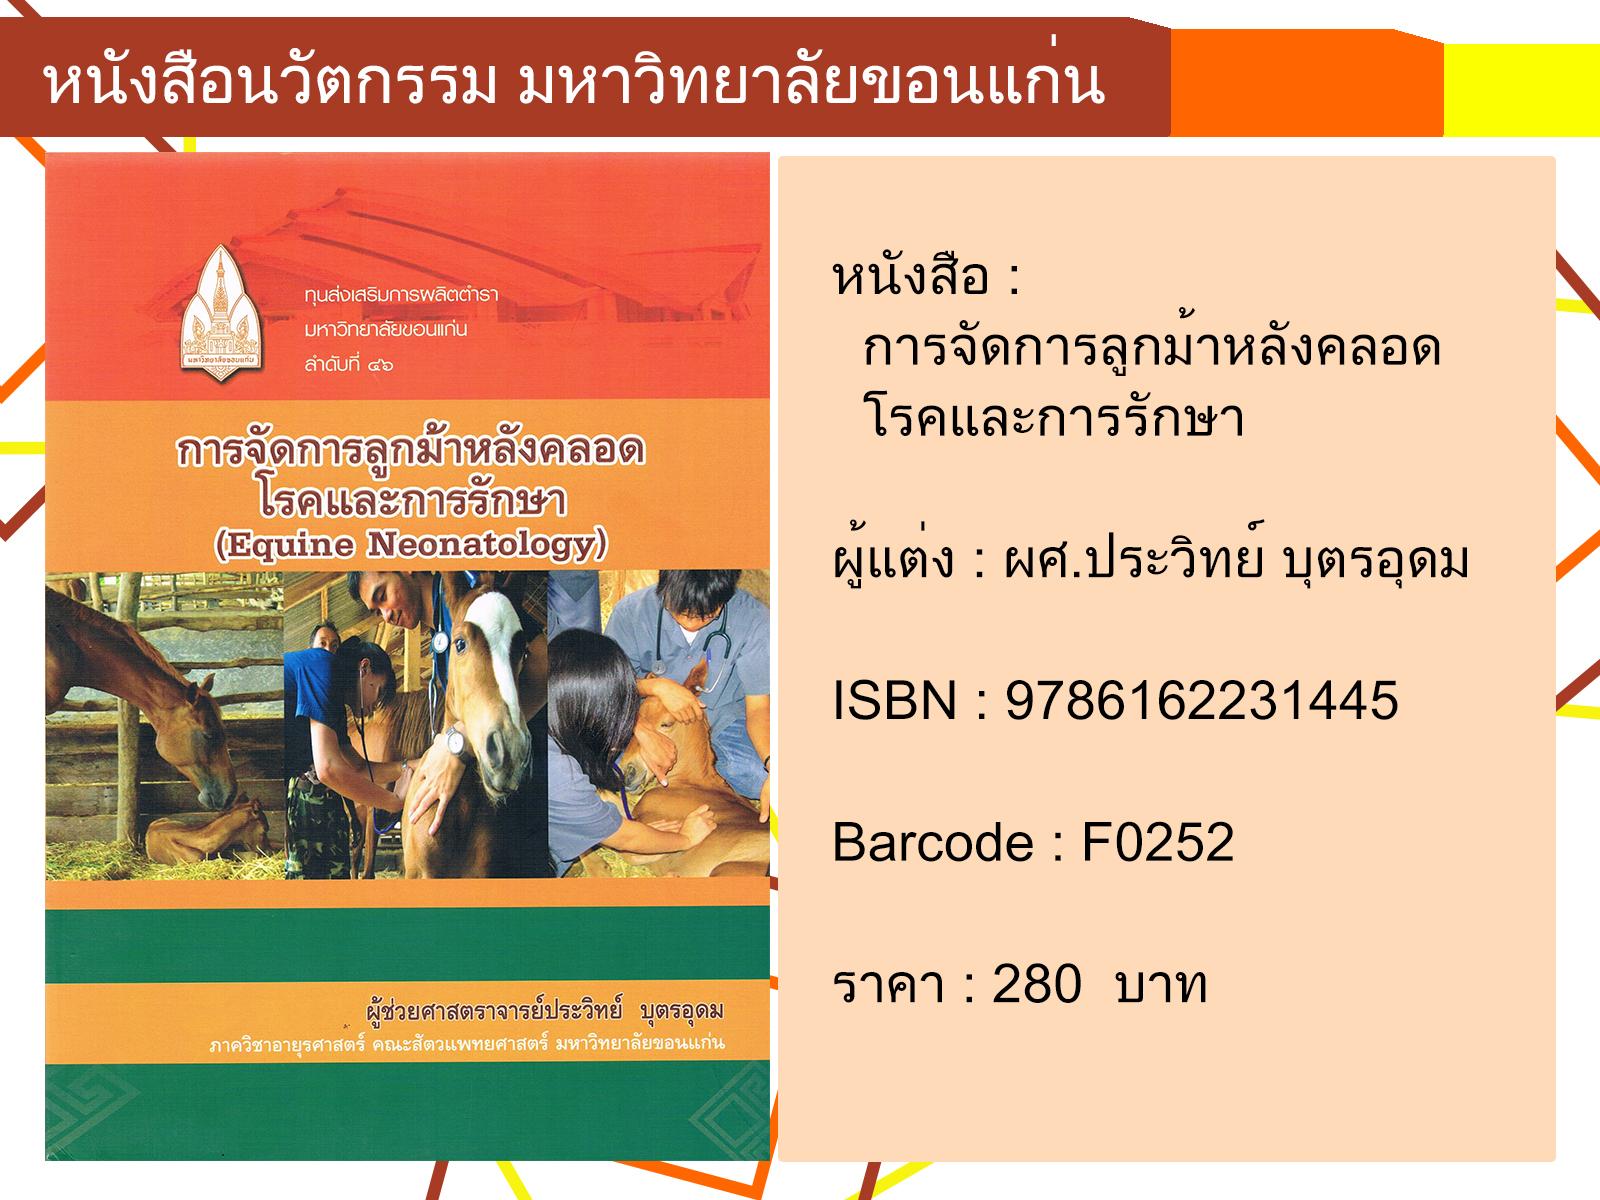 (Pre-Order) การจัดการลูกม้าหลังคลอดโรคและการรักษา